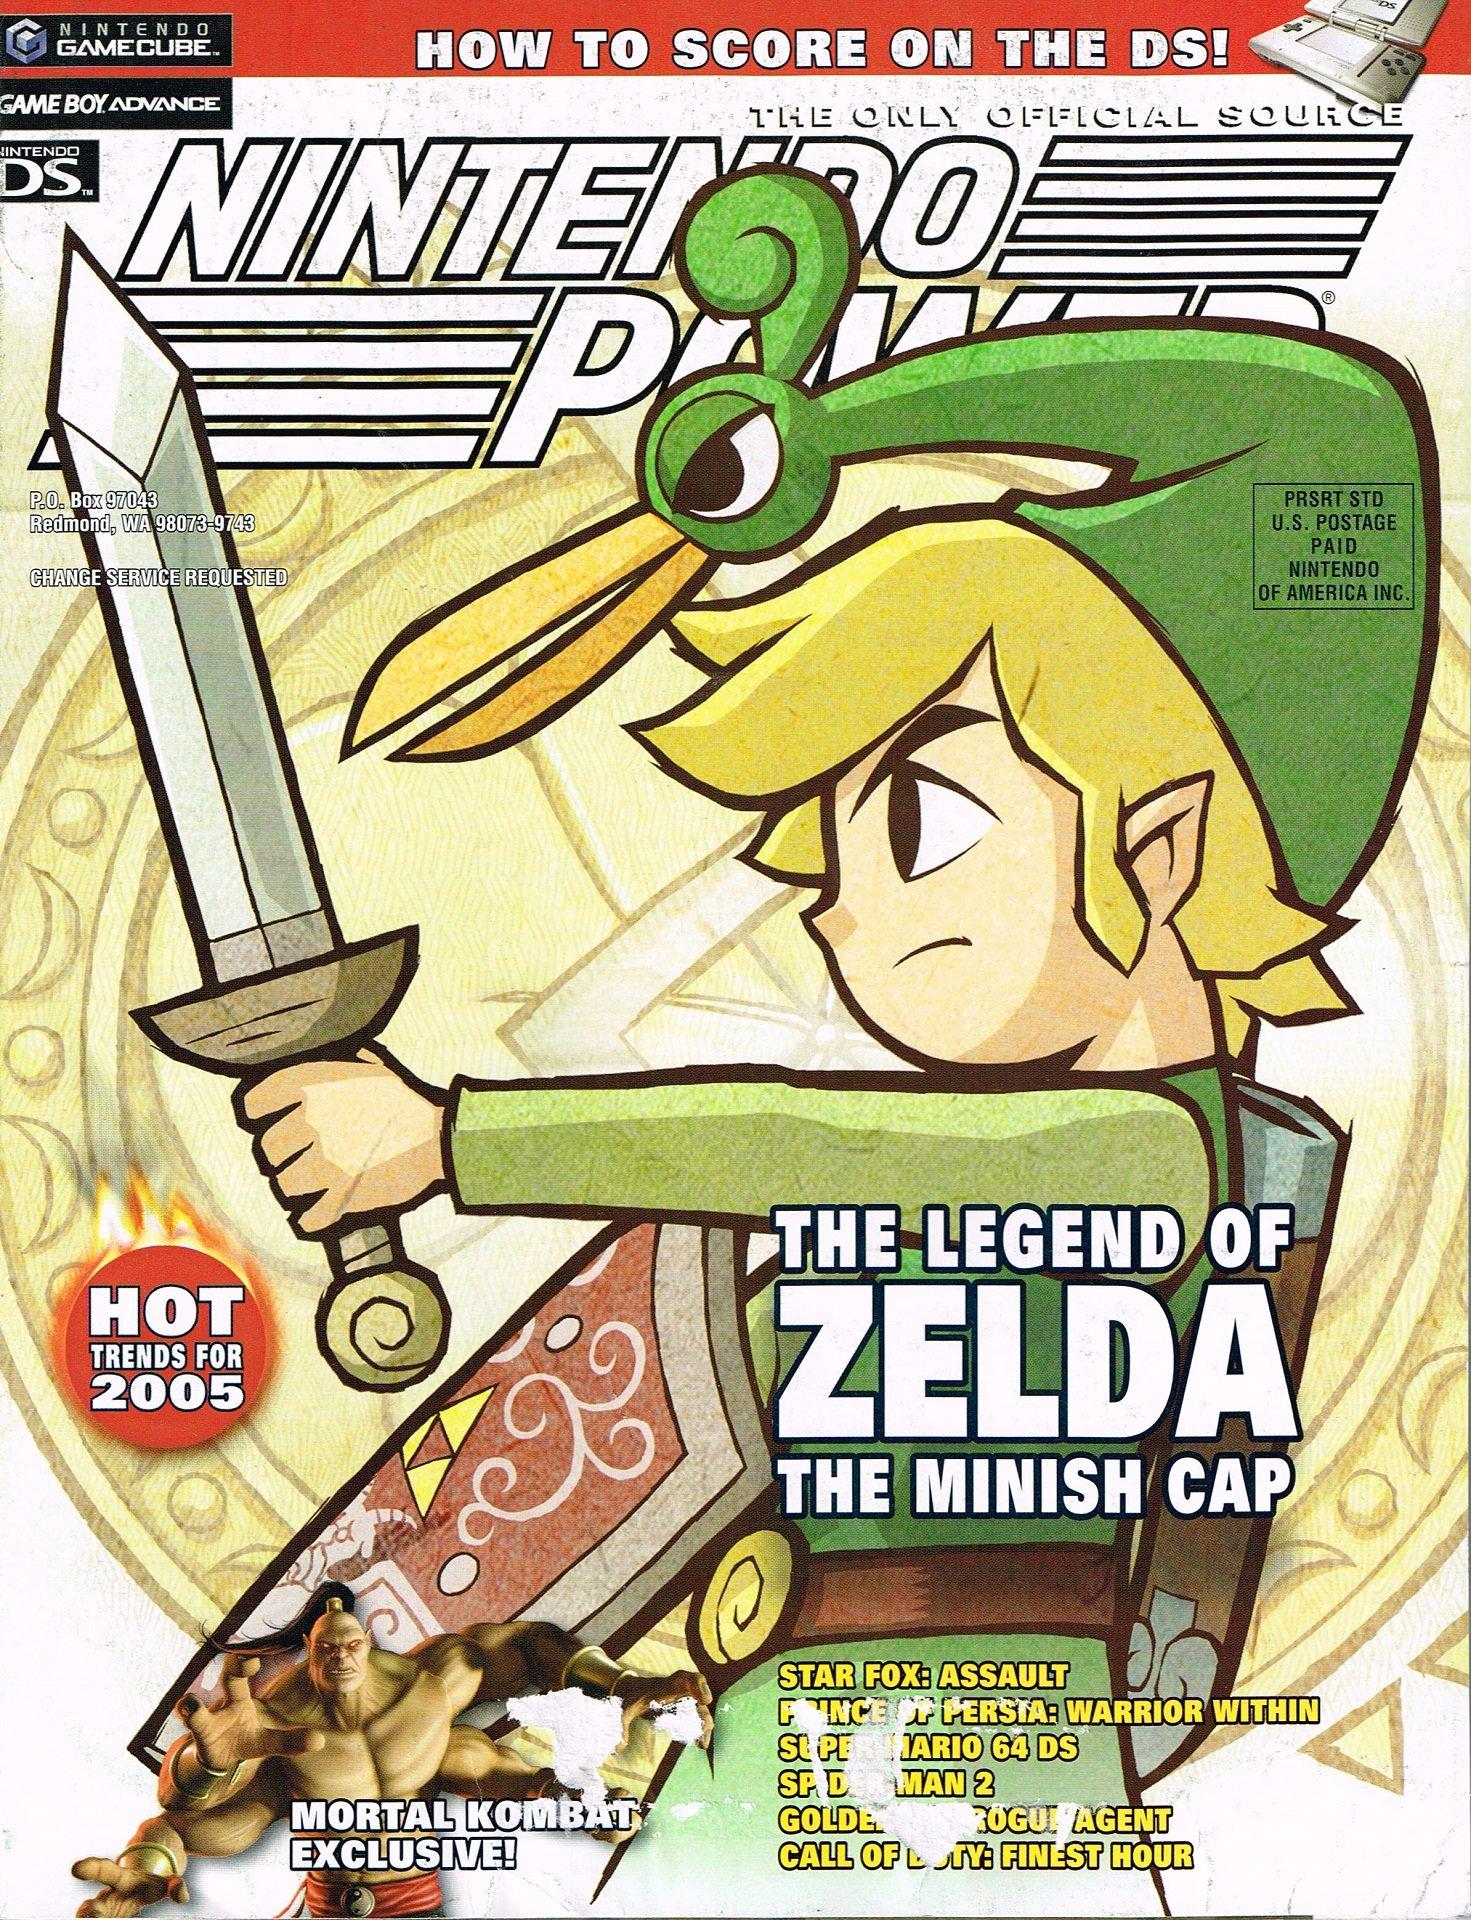 Nintendo Power Issue 188 (February 2005)